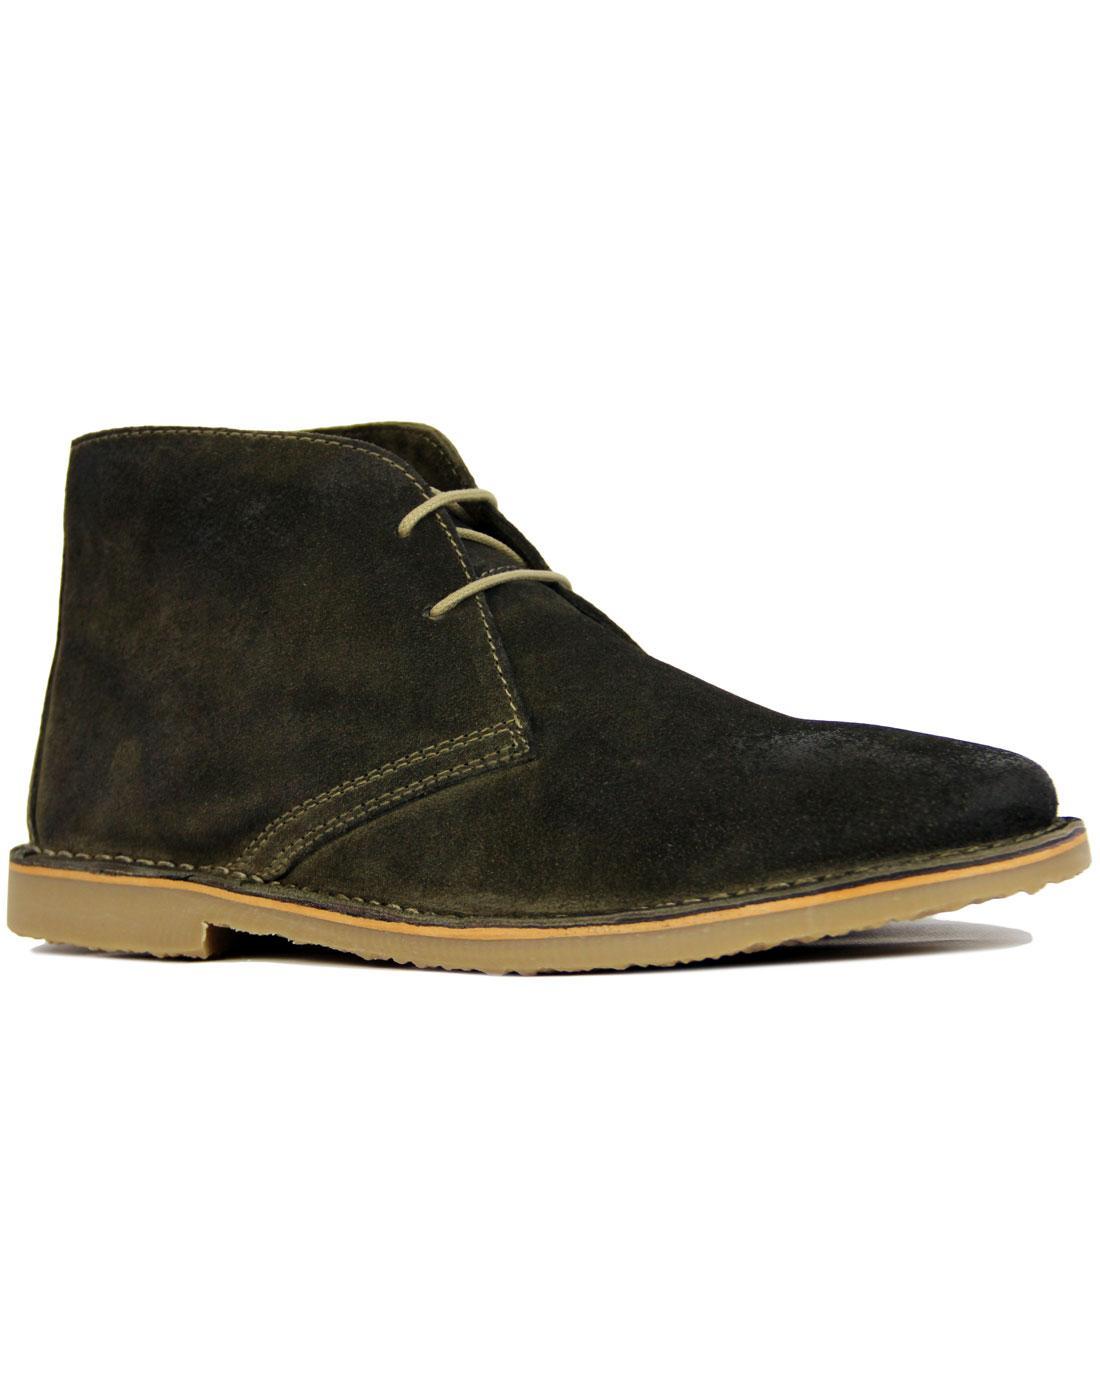 retro mod desert boots